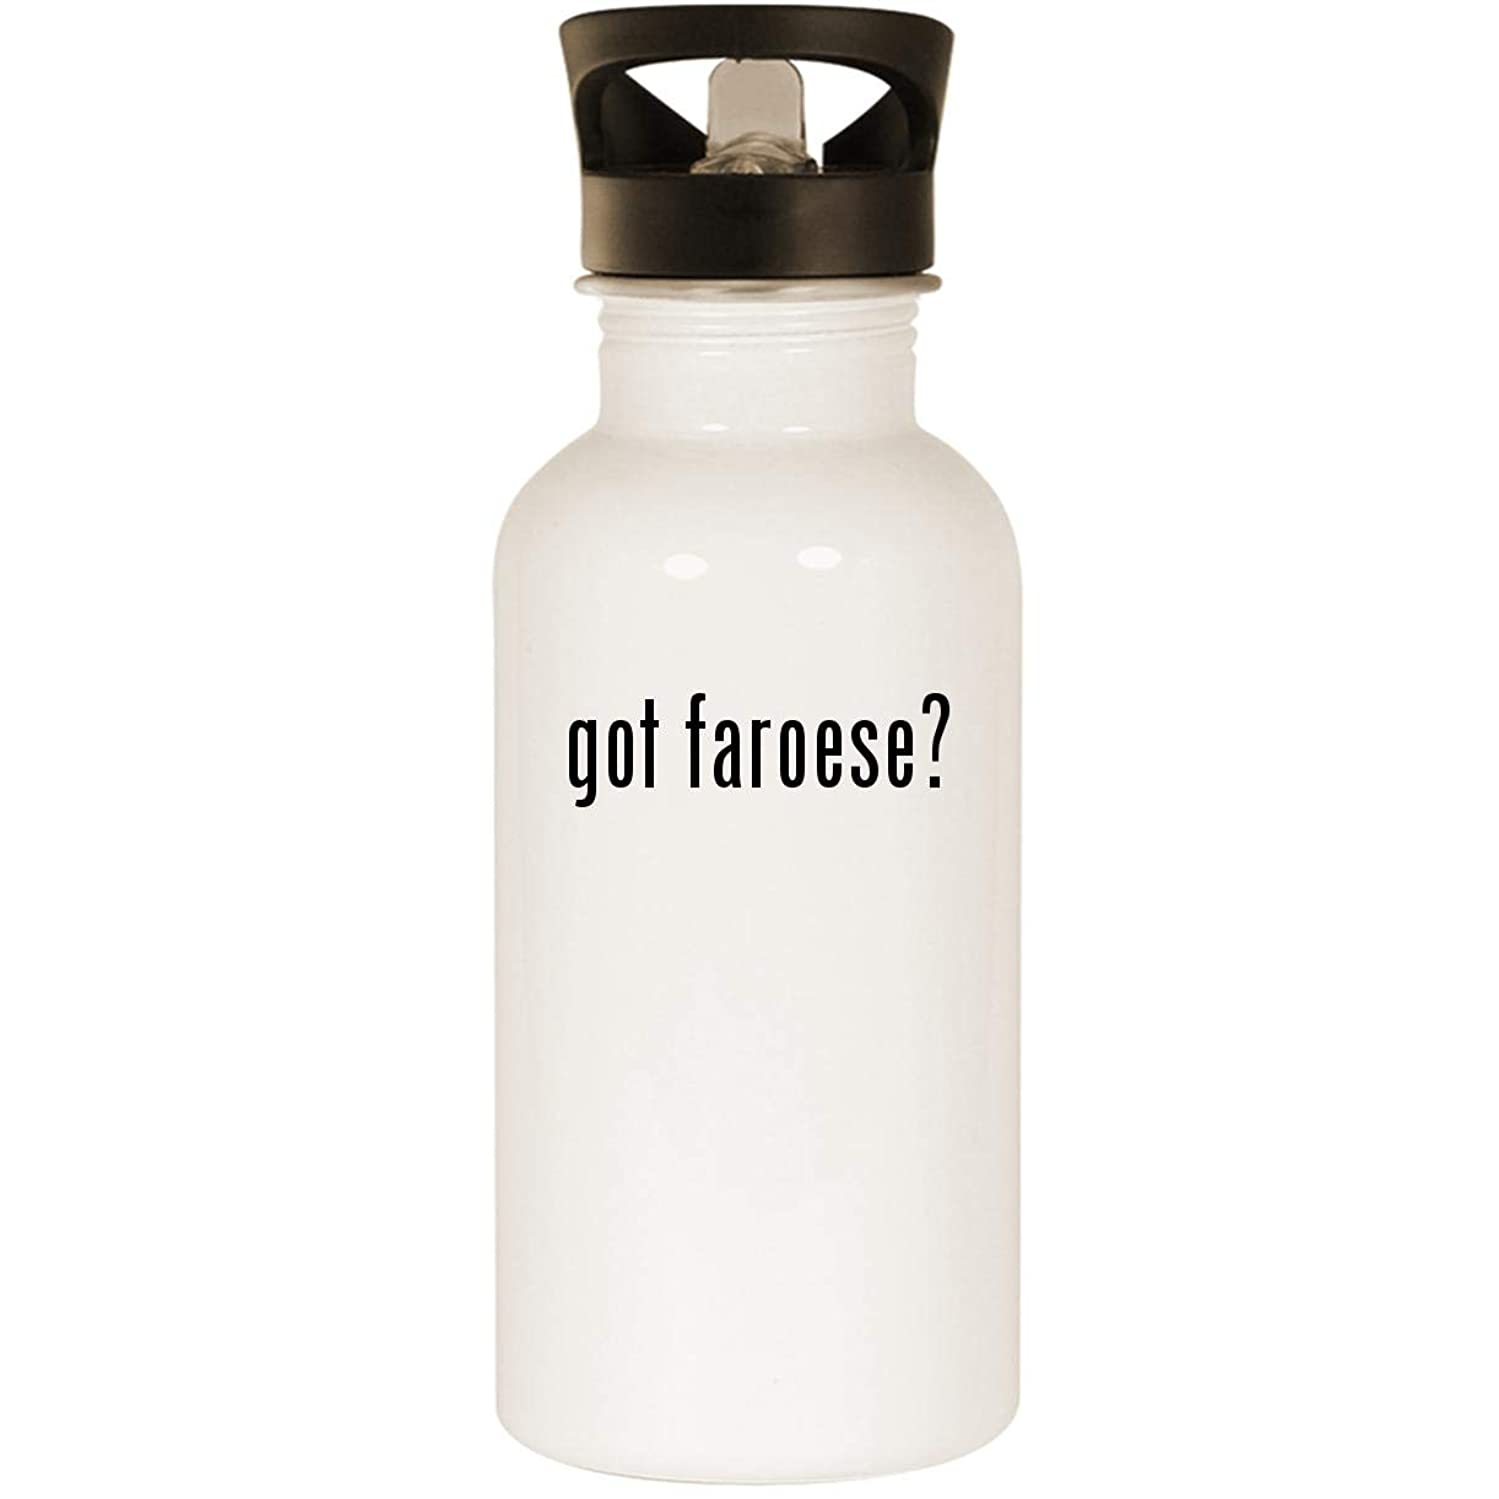 got faroese? - Stainless Steel 20oz Road Ready Water Bottle, White